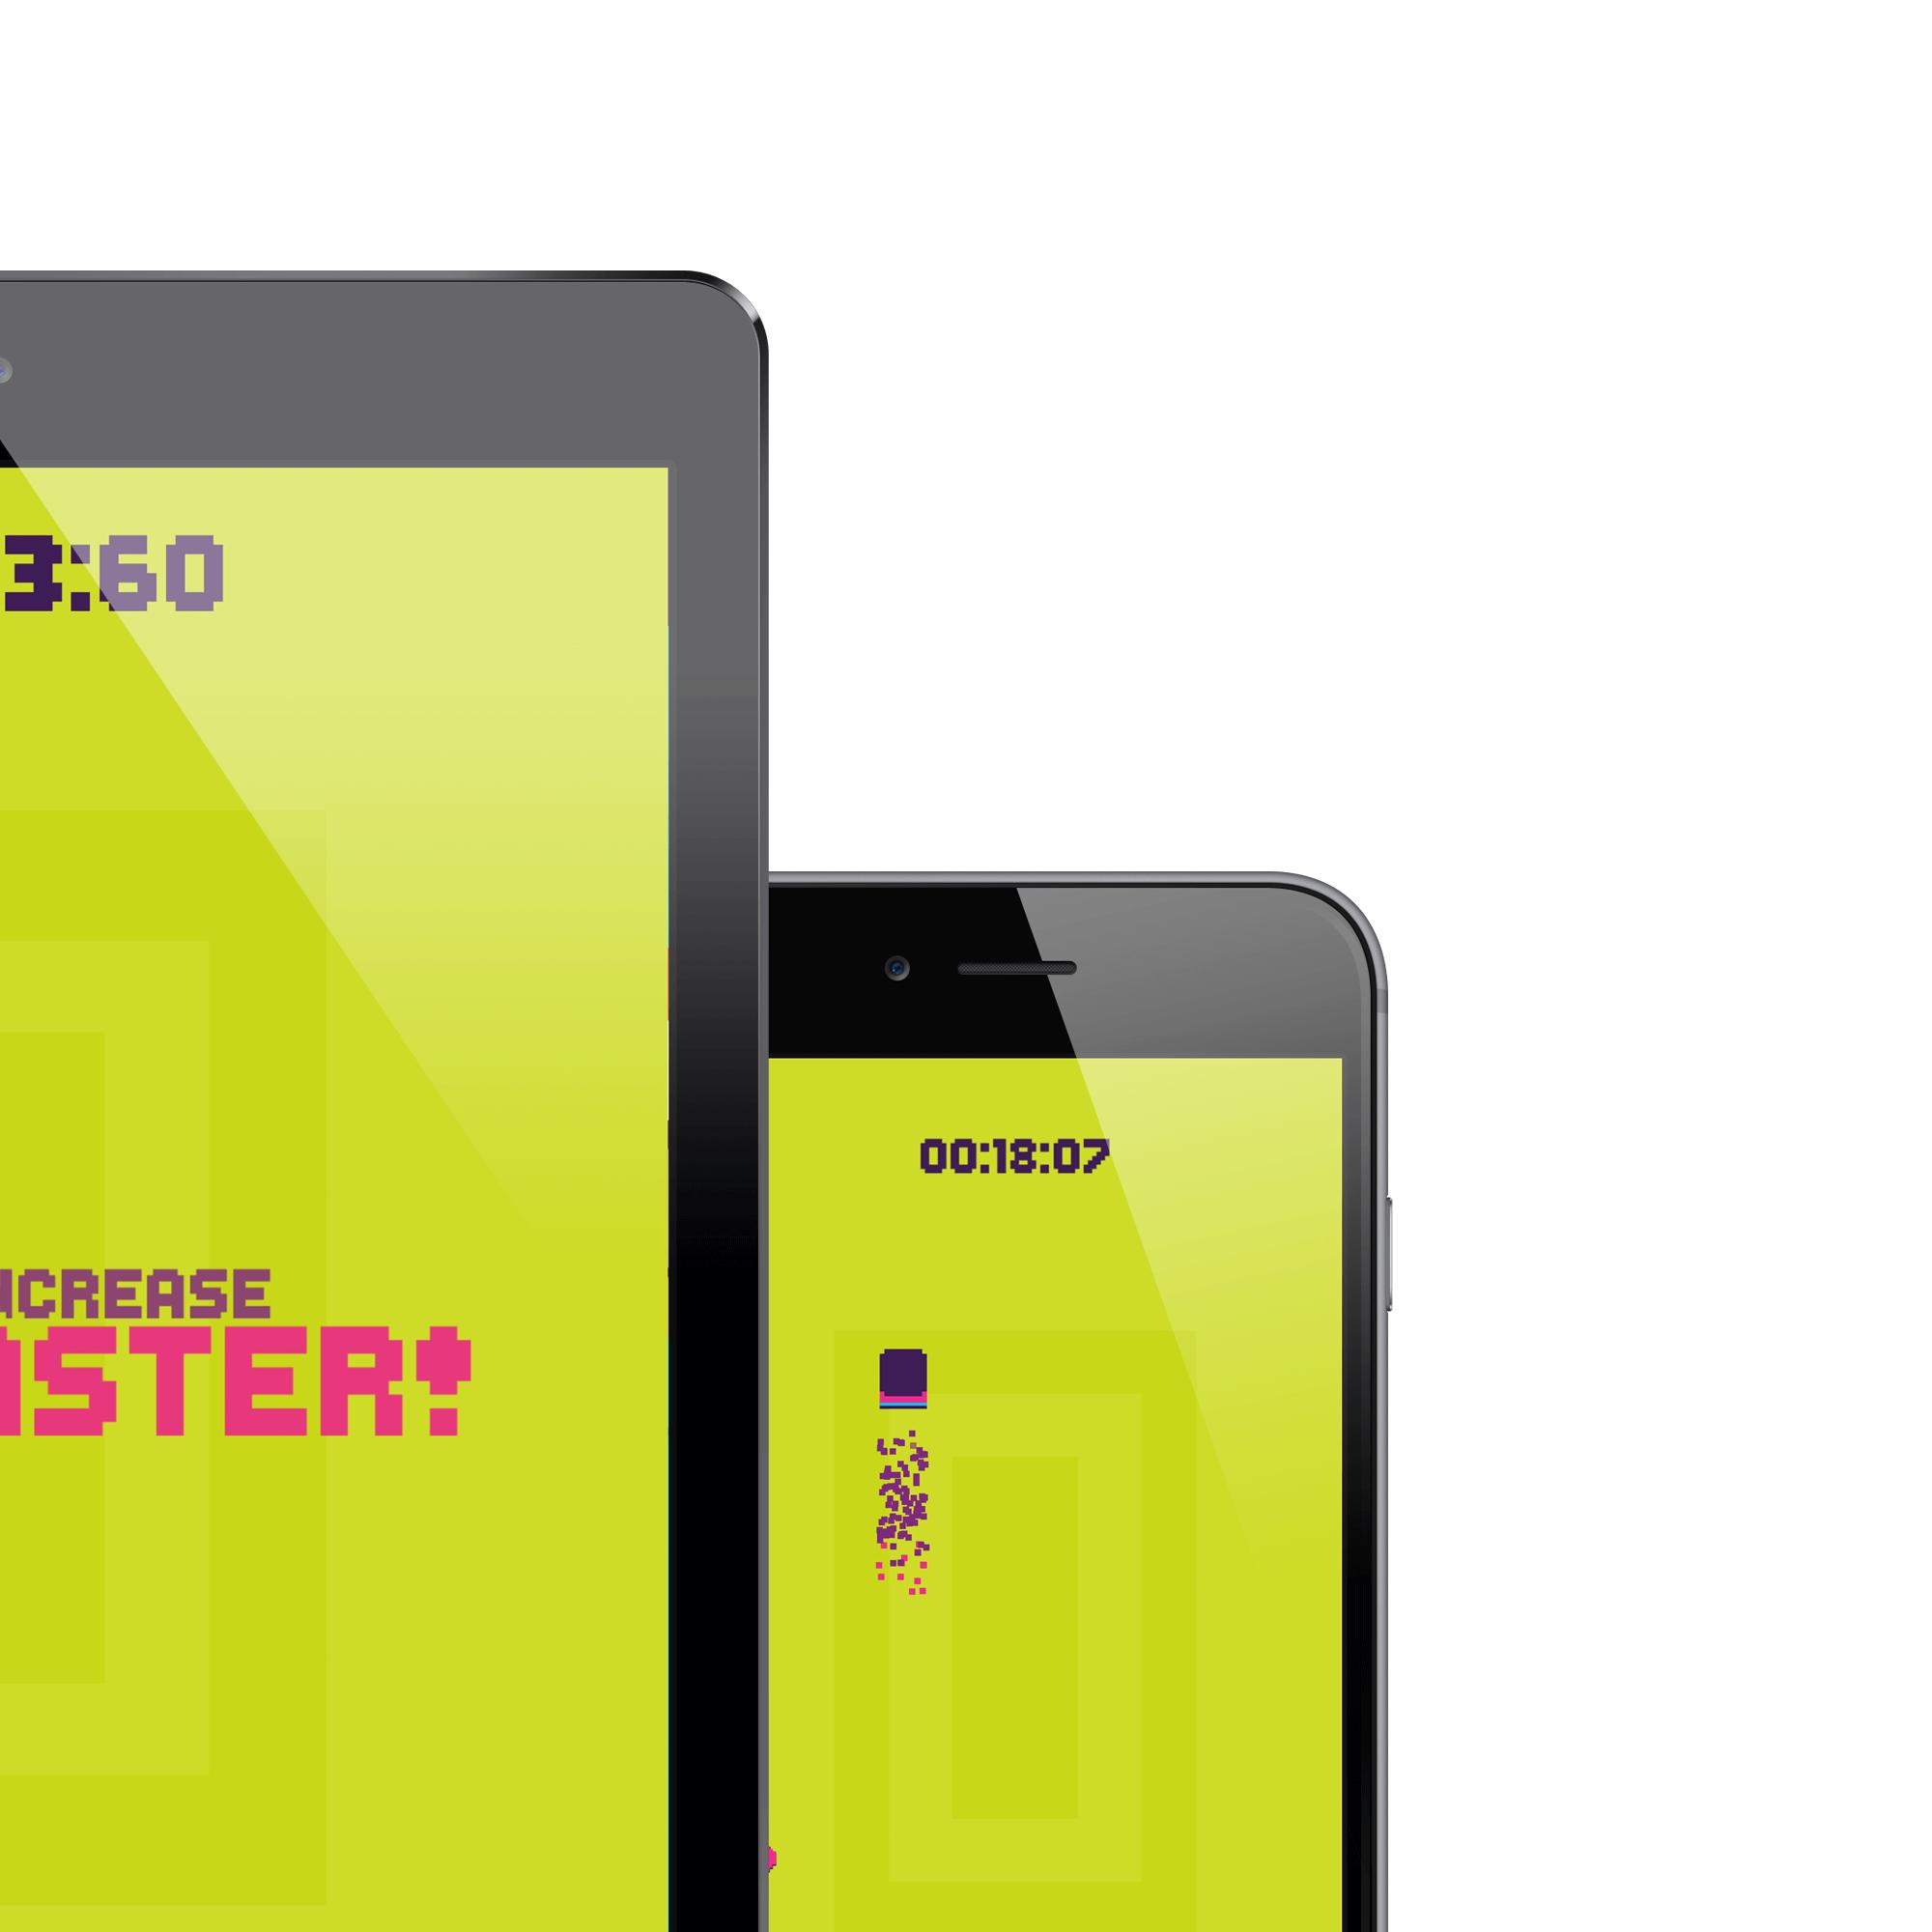 KidDotCo create Apps